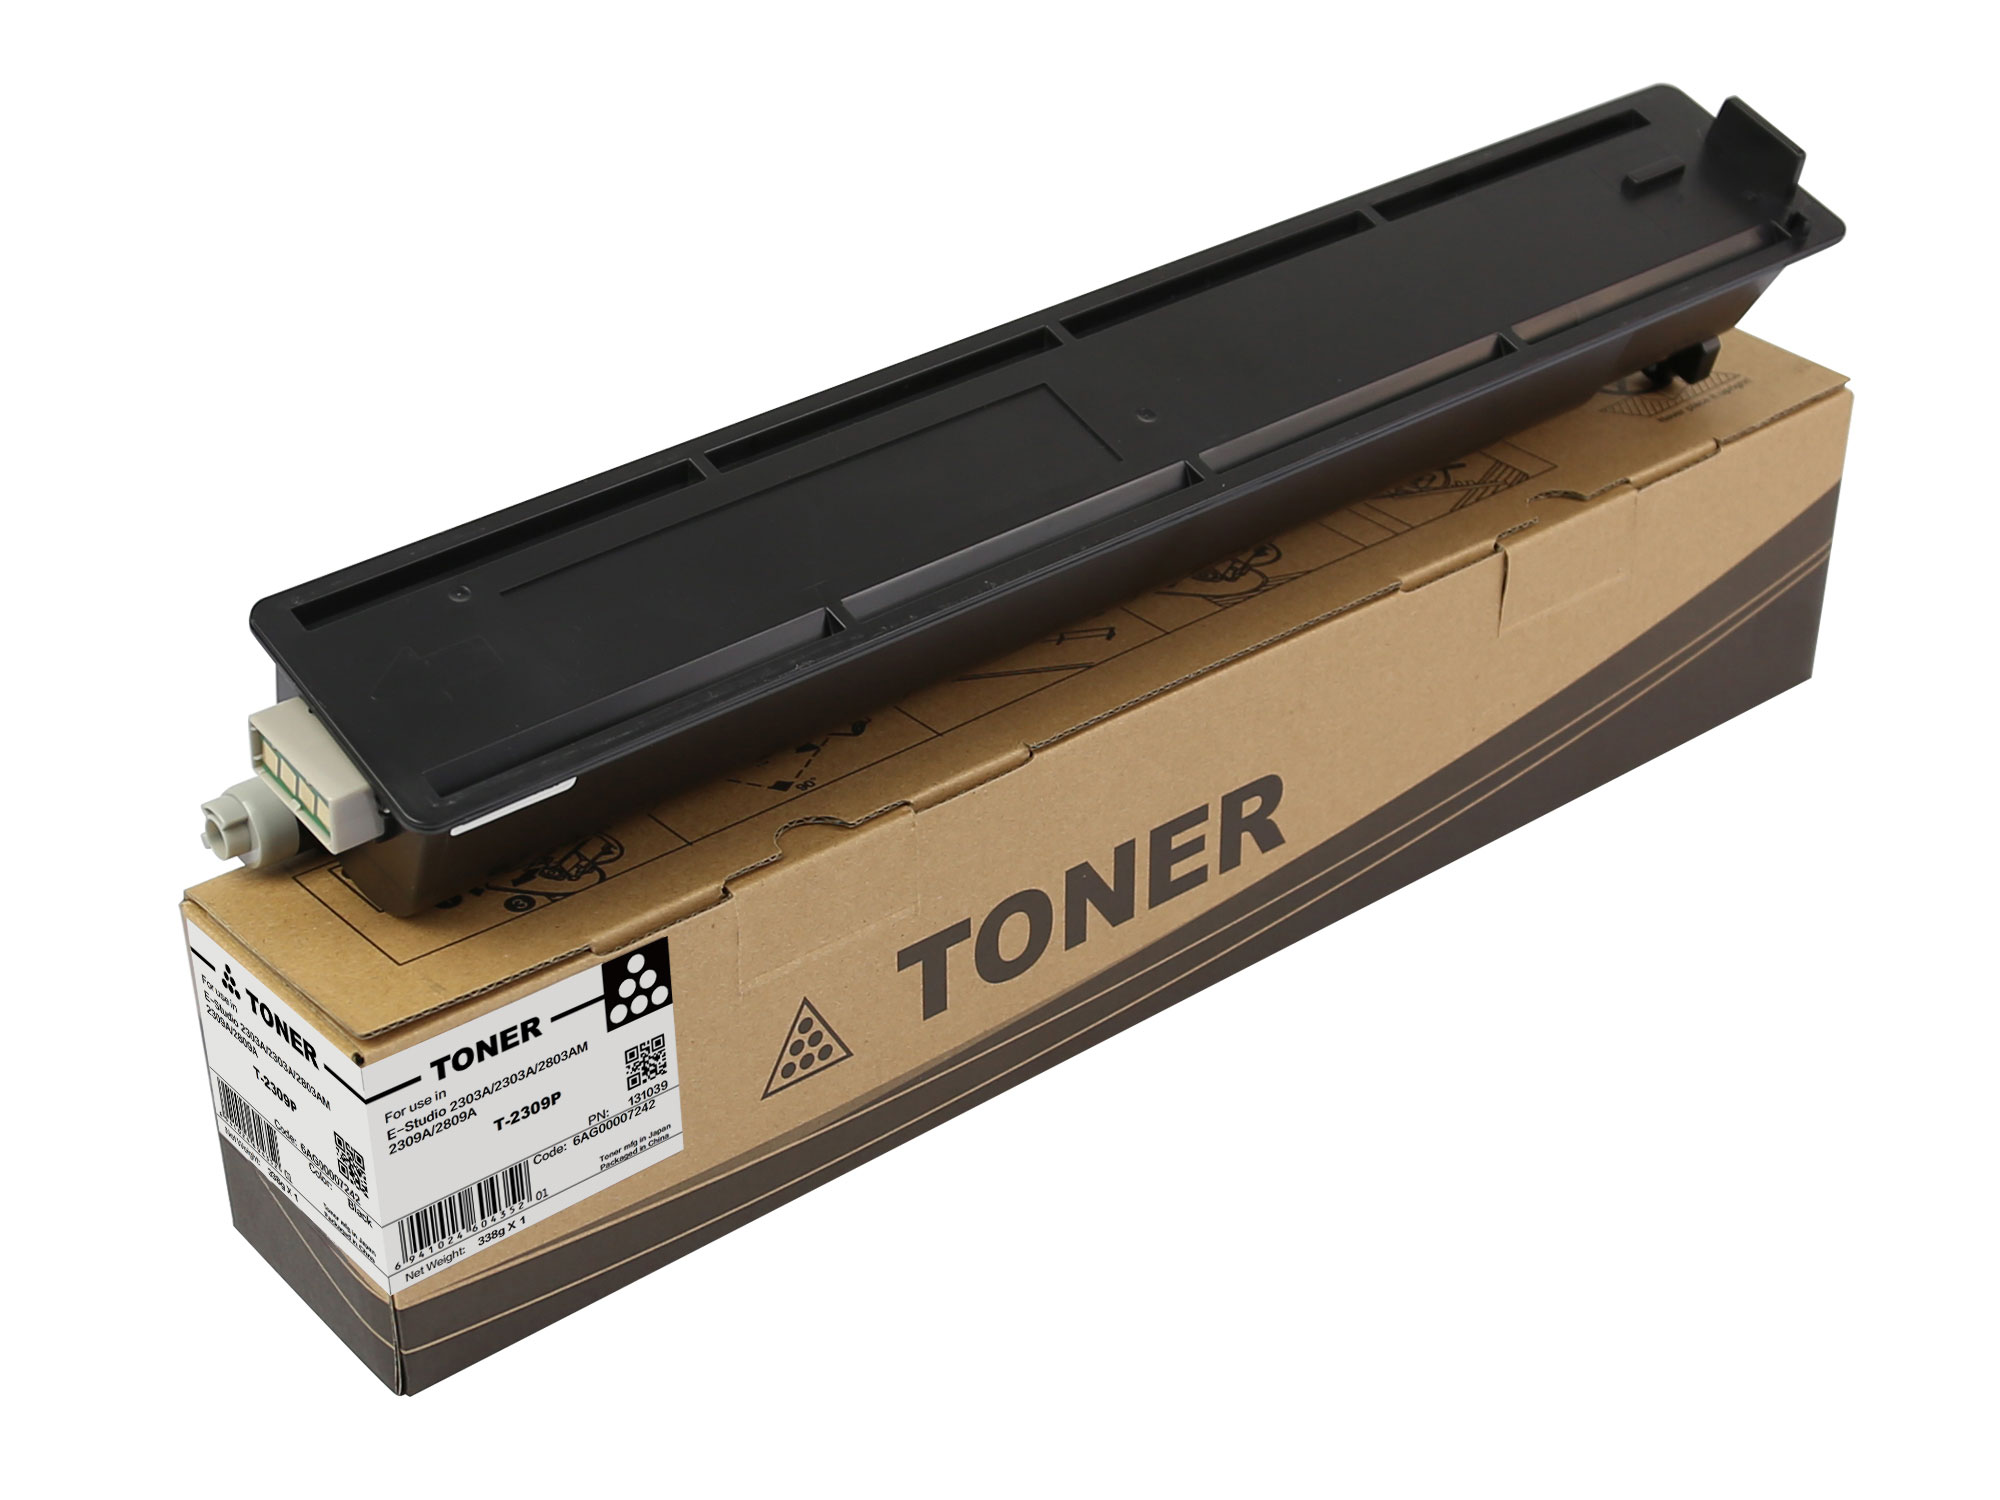 6AG00007242 T-2309P Toner Cartridge for Toshiba E-Studio 2303A